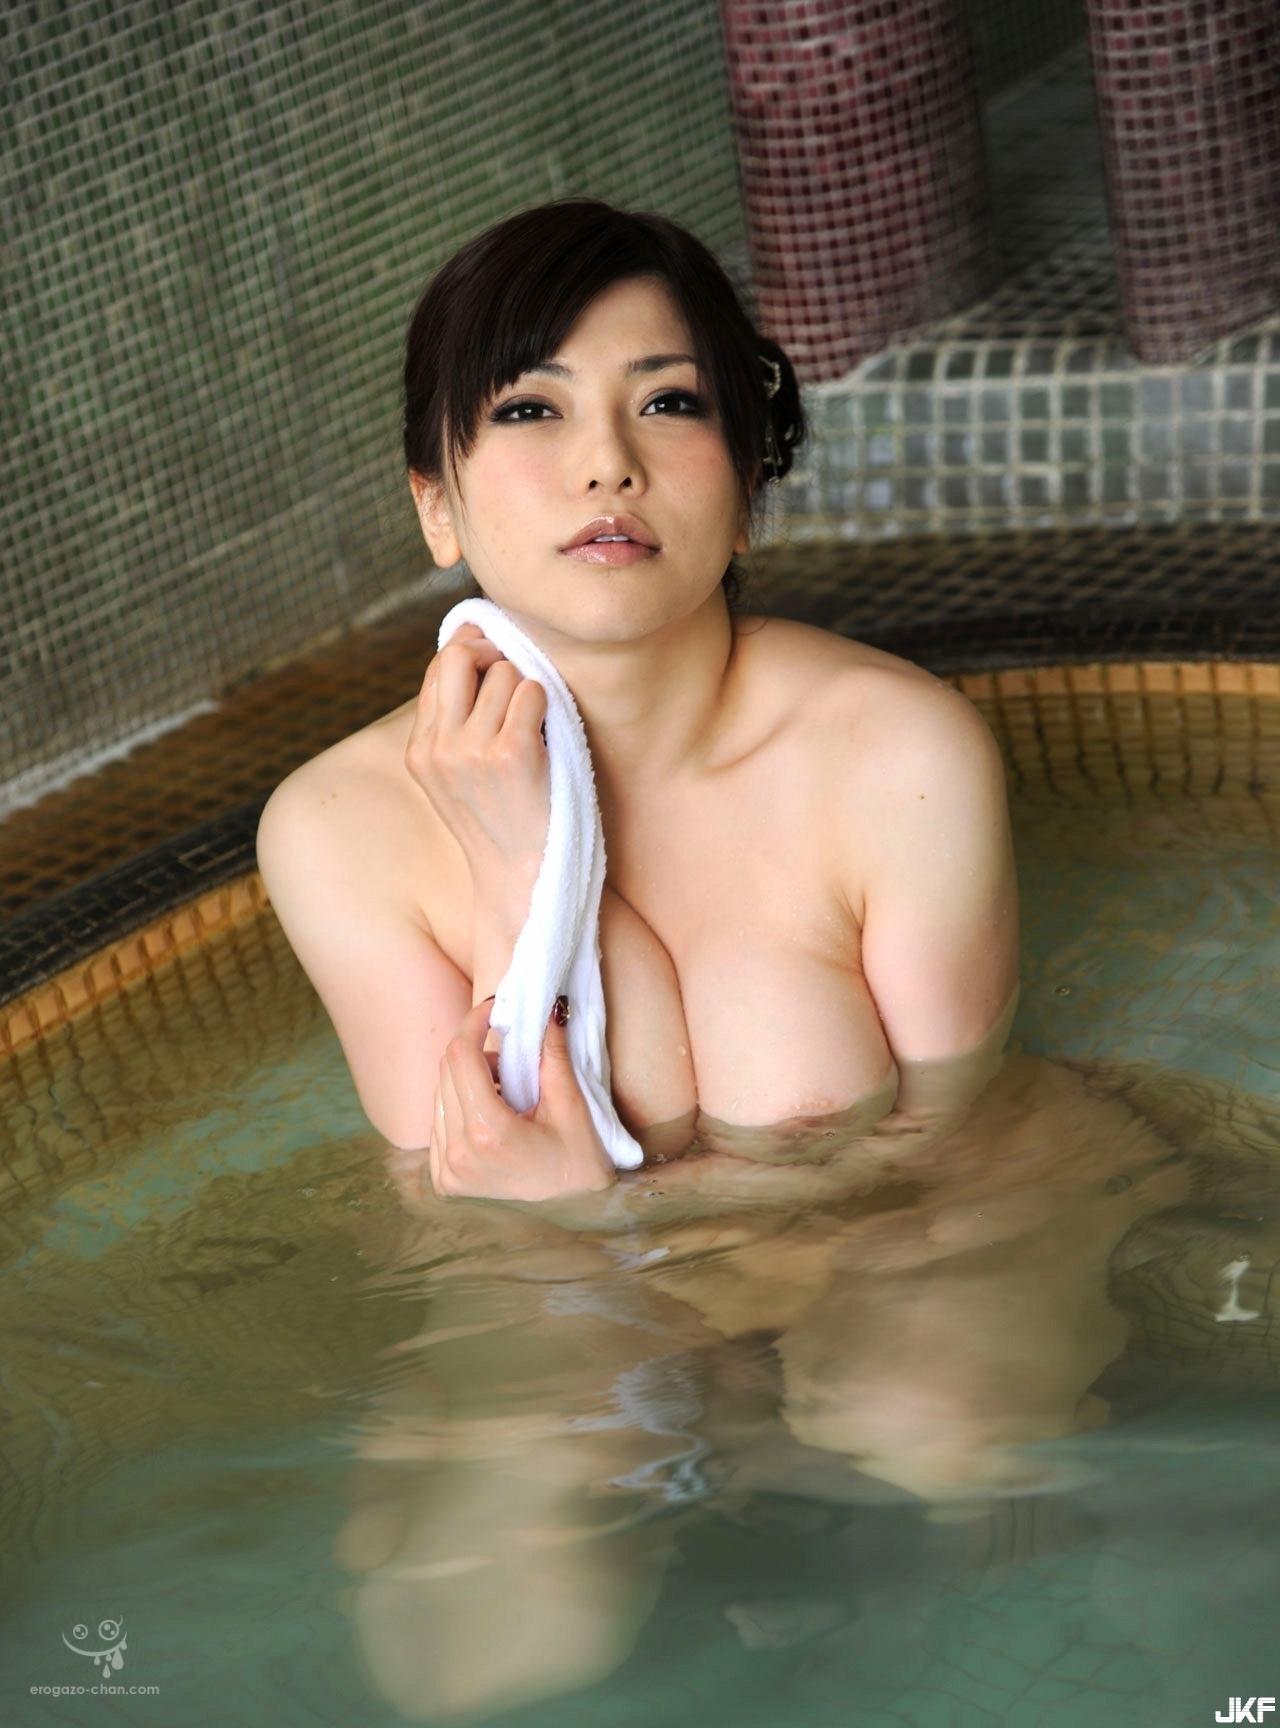 okita_anri_1074-185.jpg